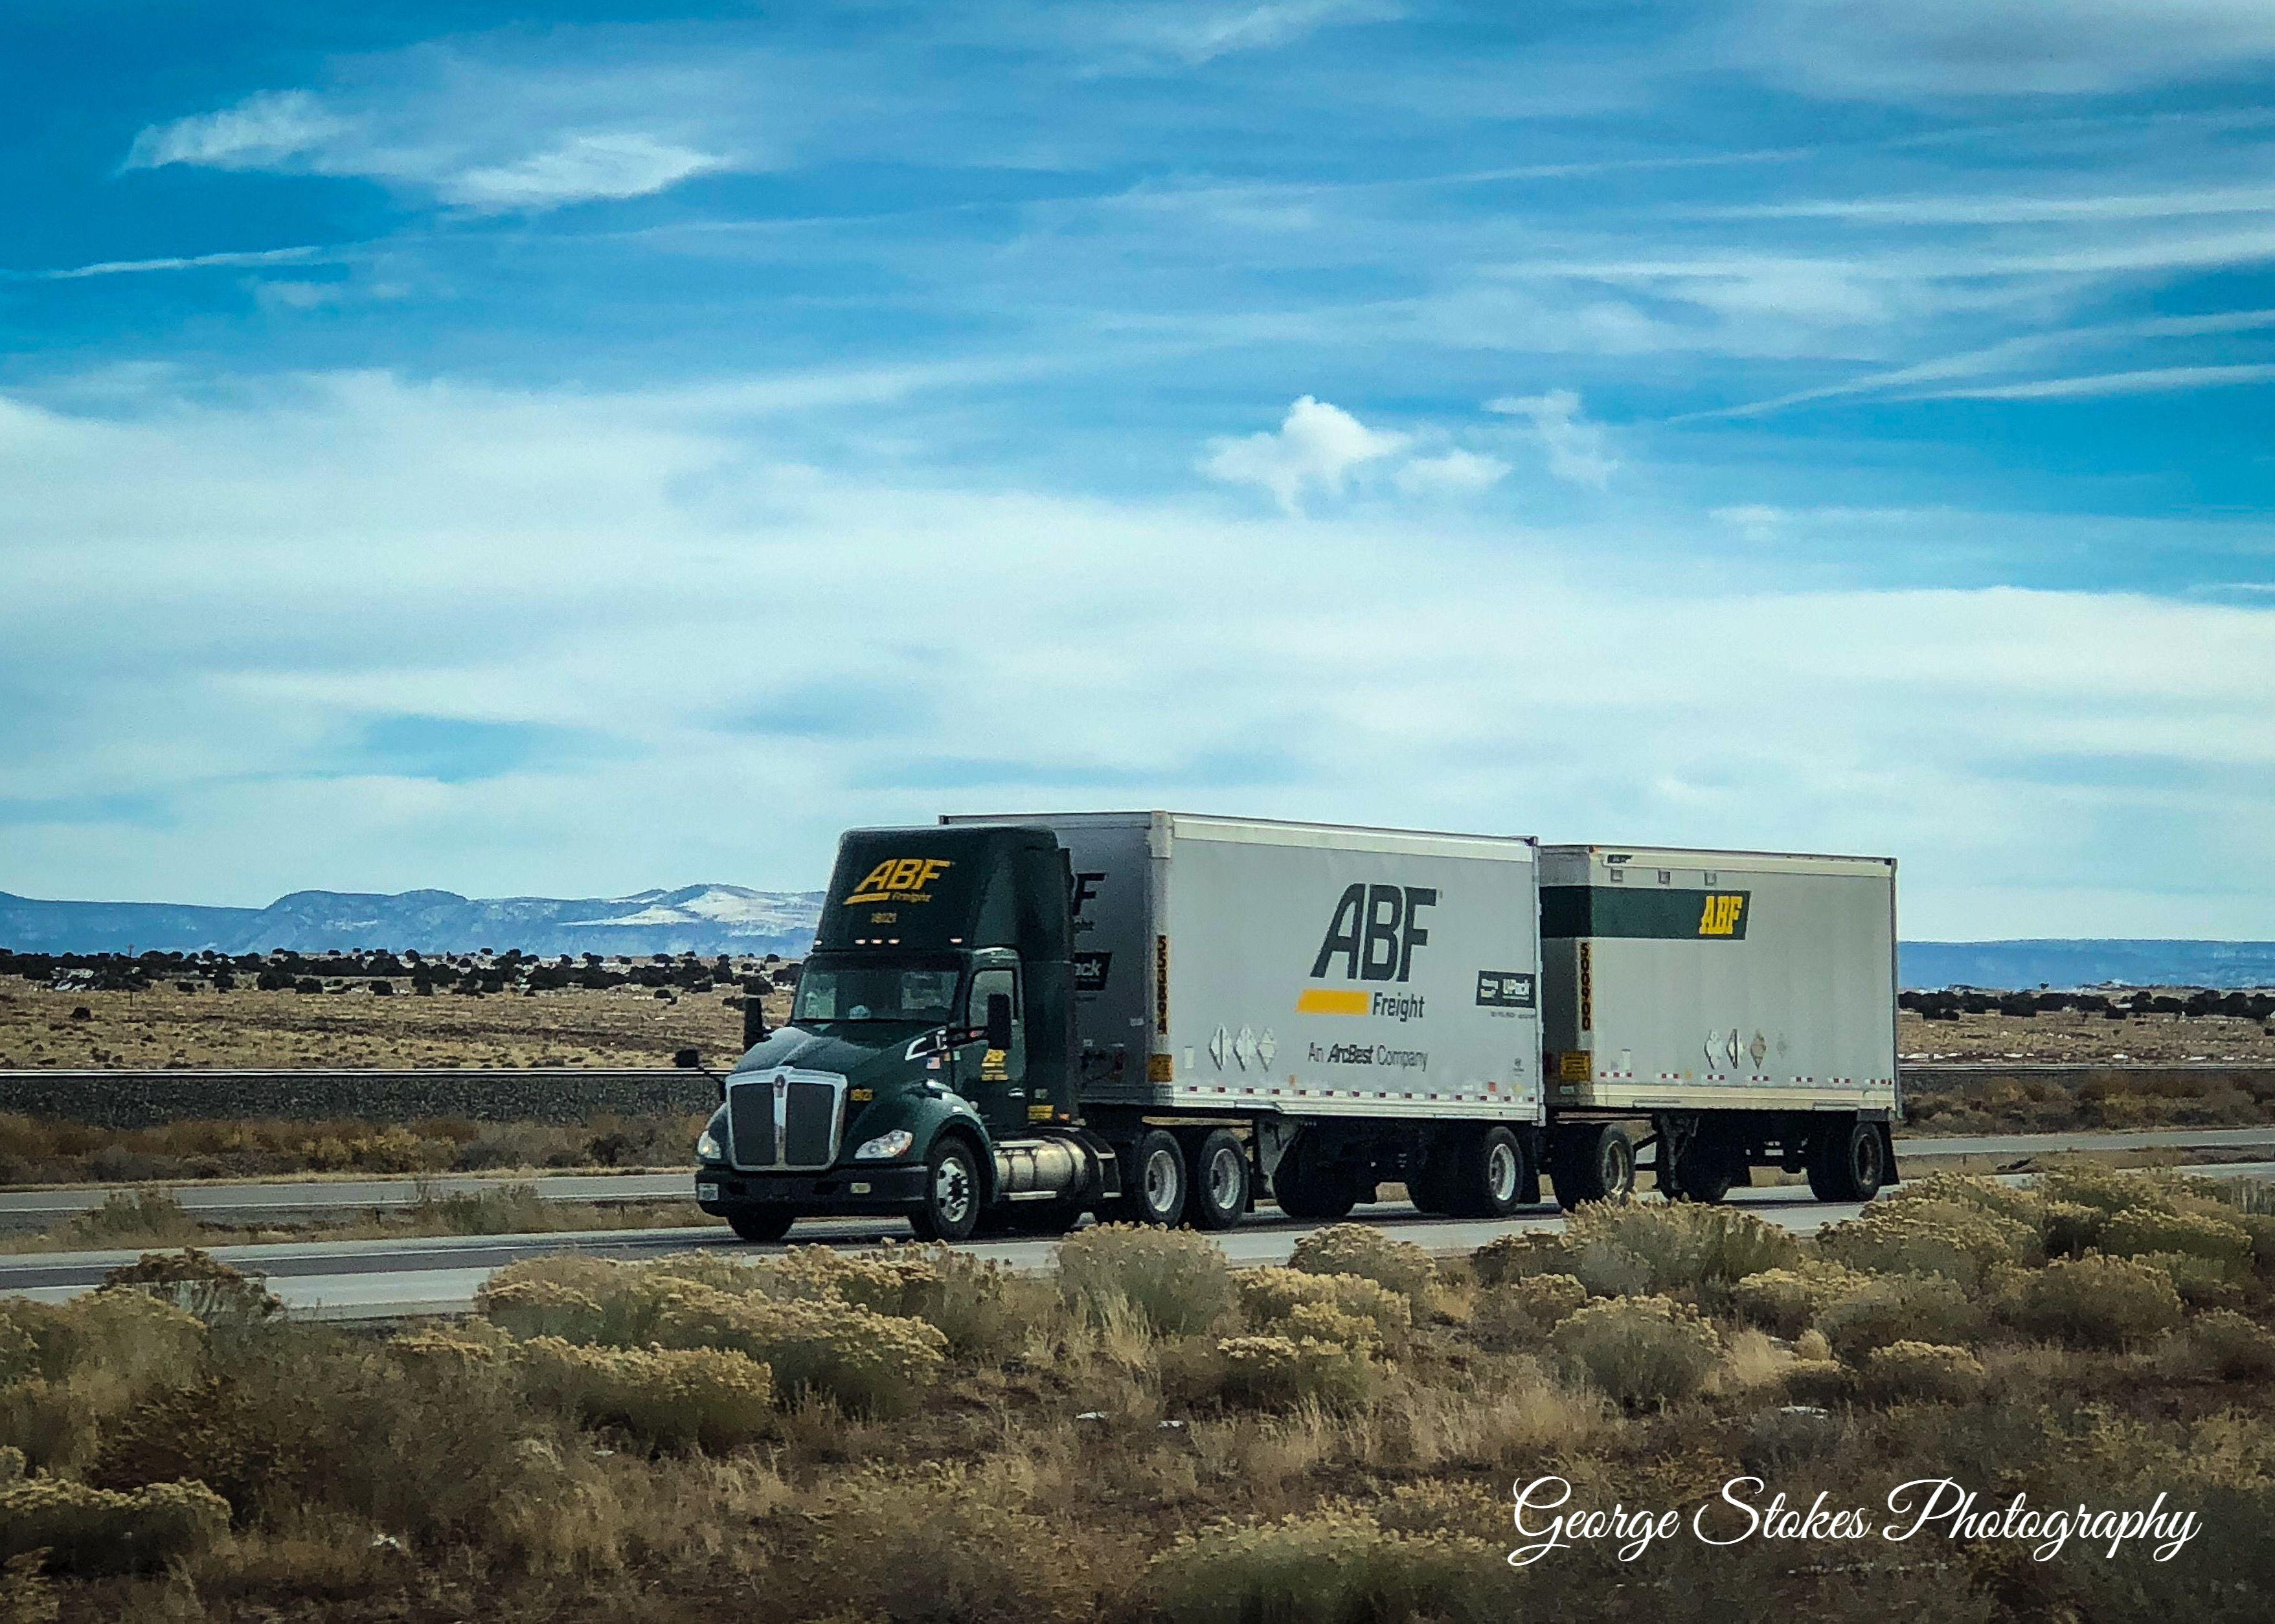 Abf freight kenworth kenworth show trucks road train